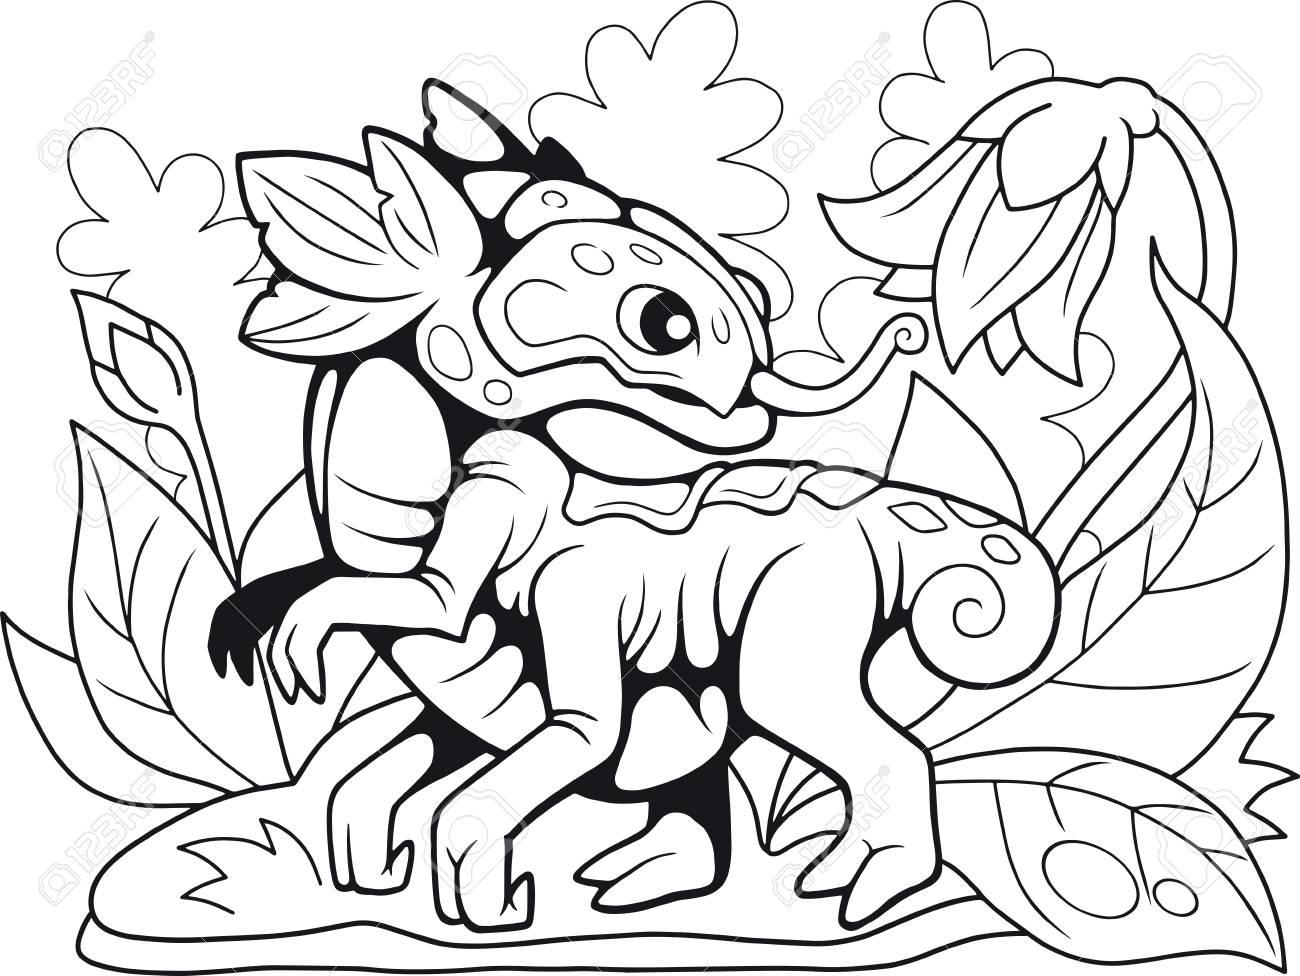 - Cartoon Cute Flower Dragon, Coloring Book, Funny Illustration